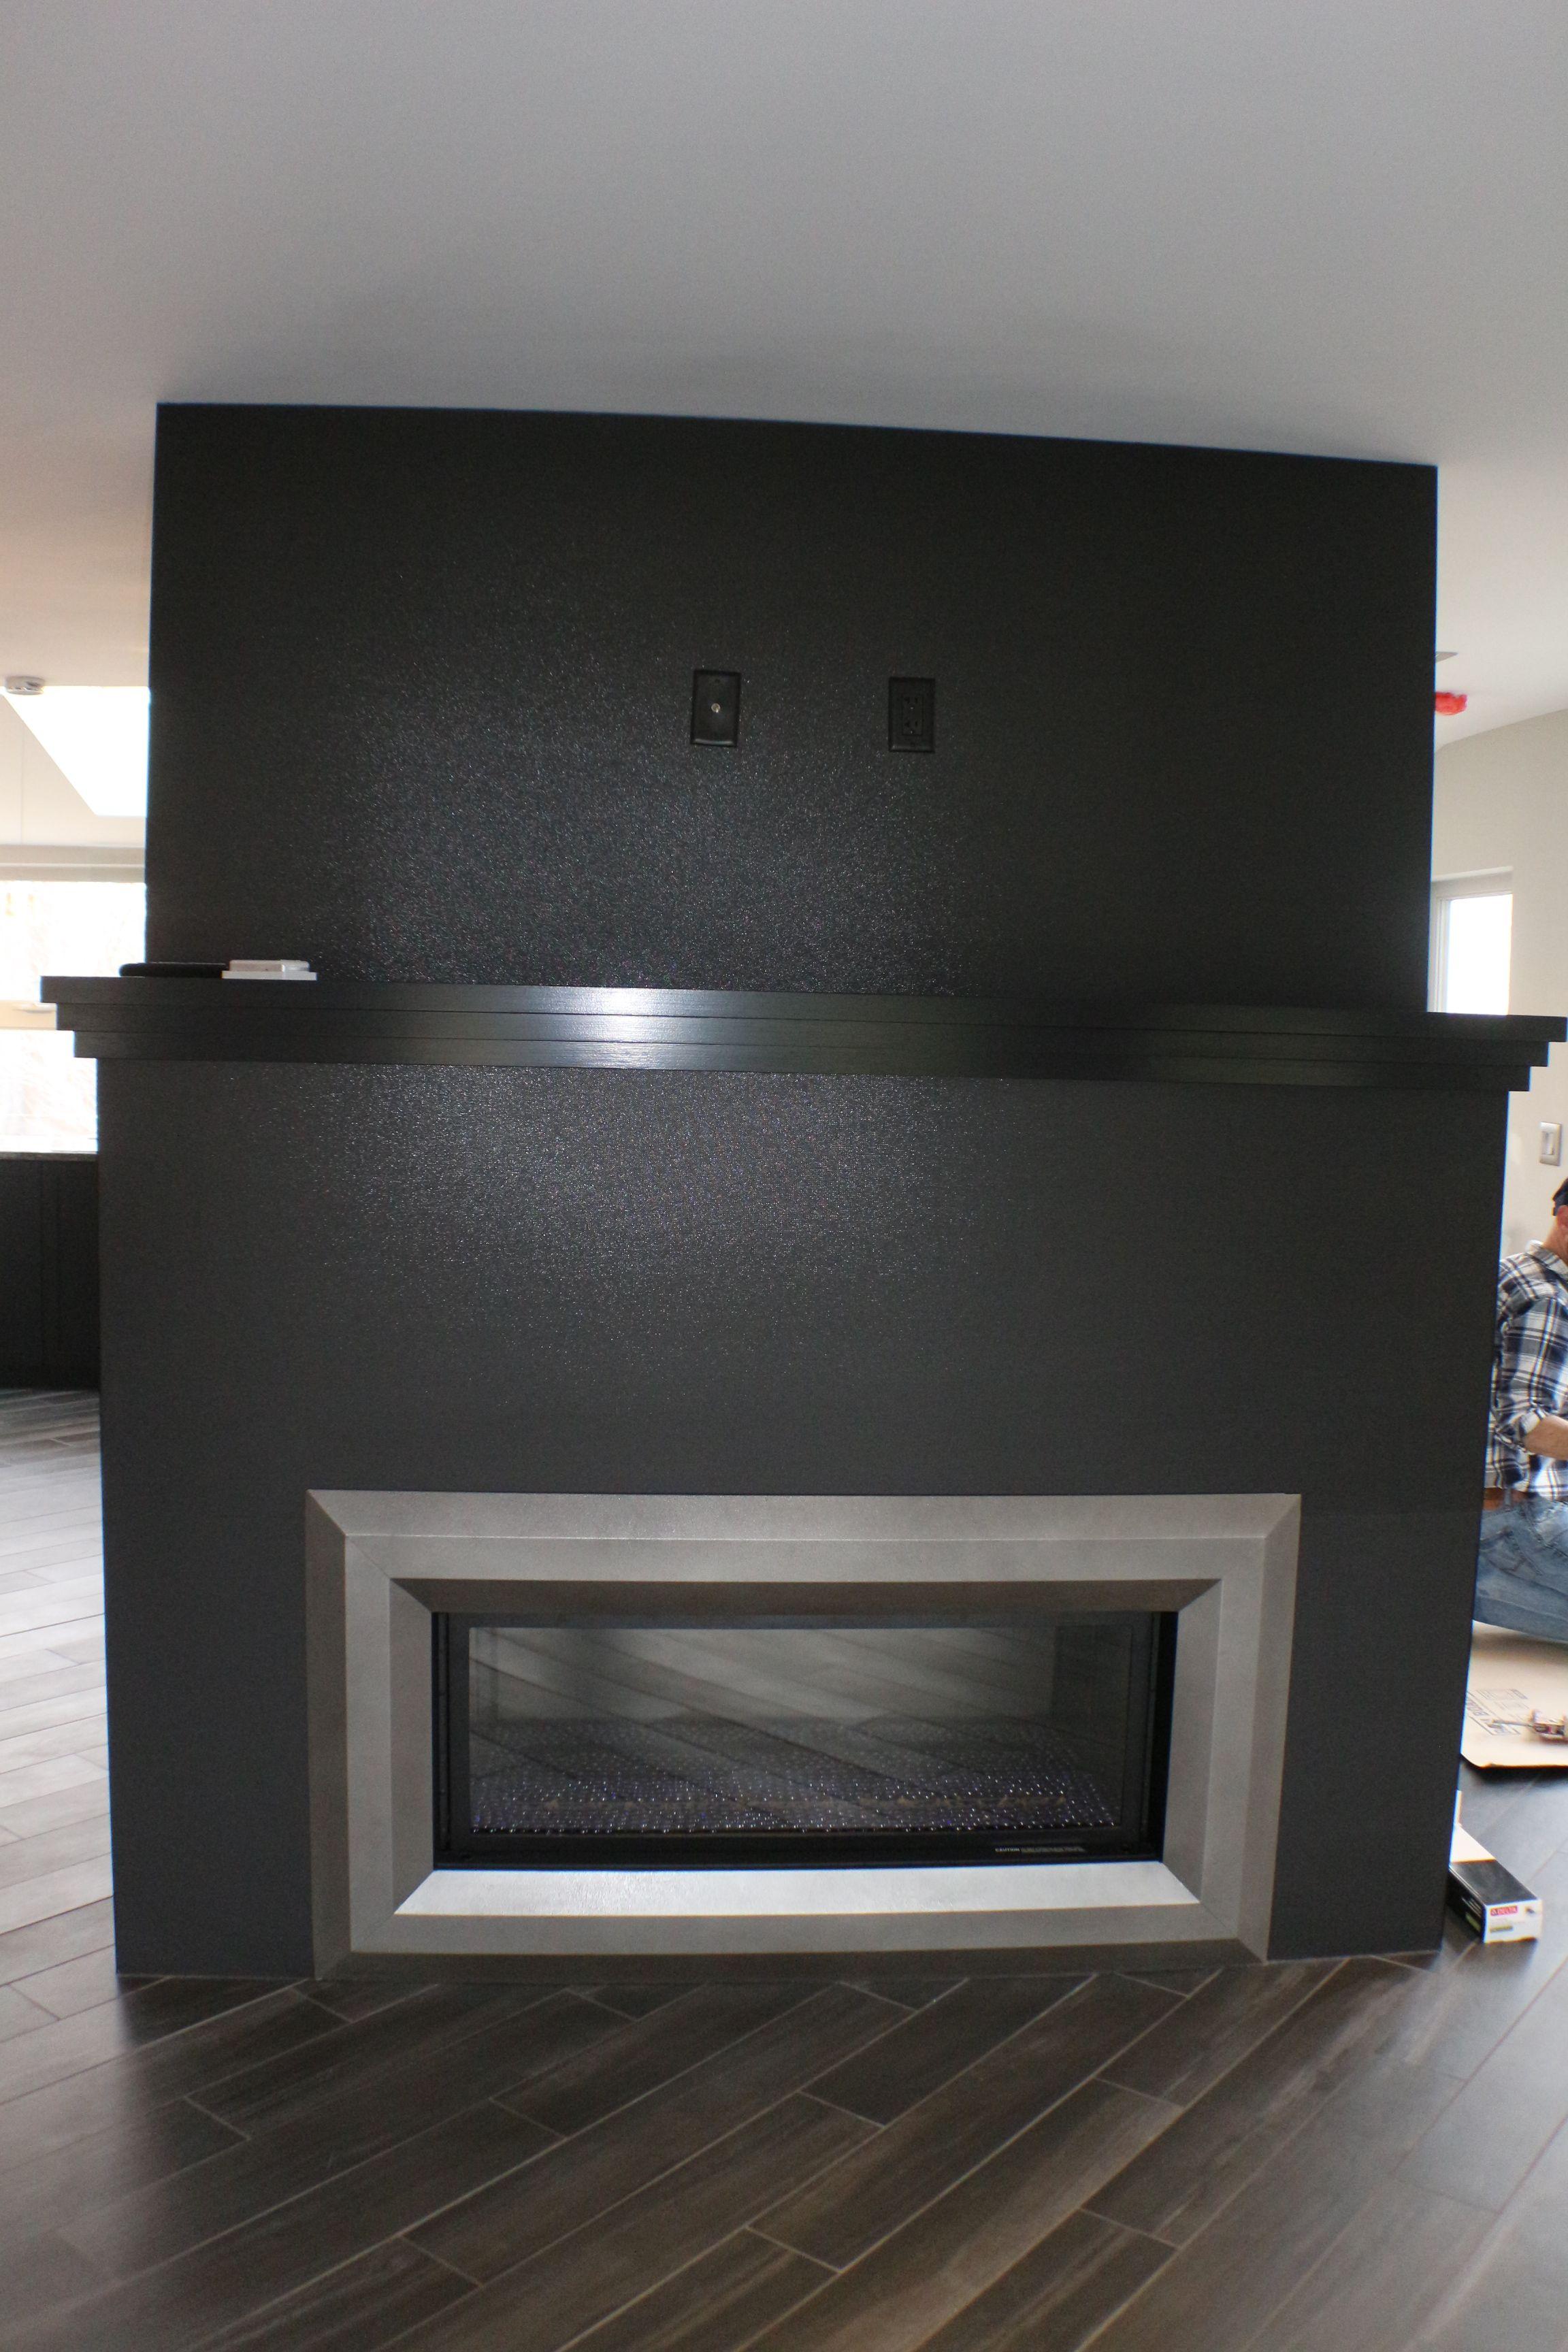 Modern laminam fireplace install laminam is a 1mx3m large format laminam is a 1mx3m large format thin porcelain tile panel dailygadgetfo Gallery